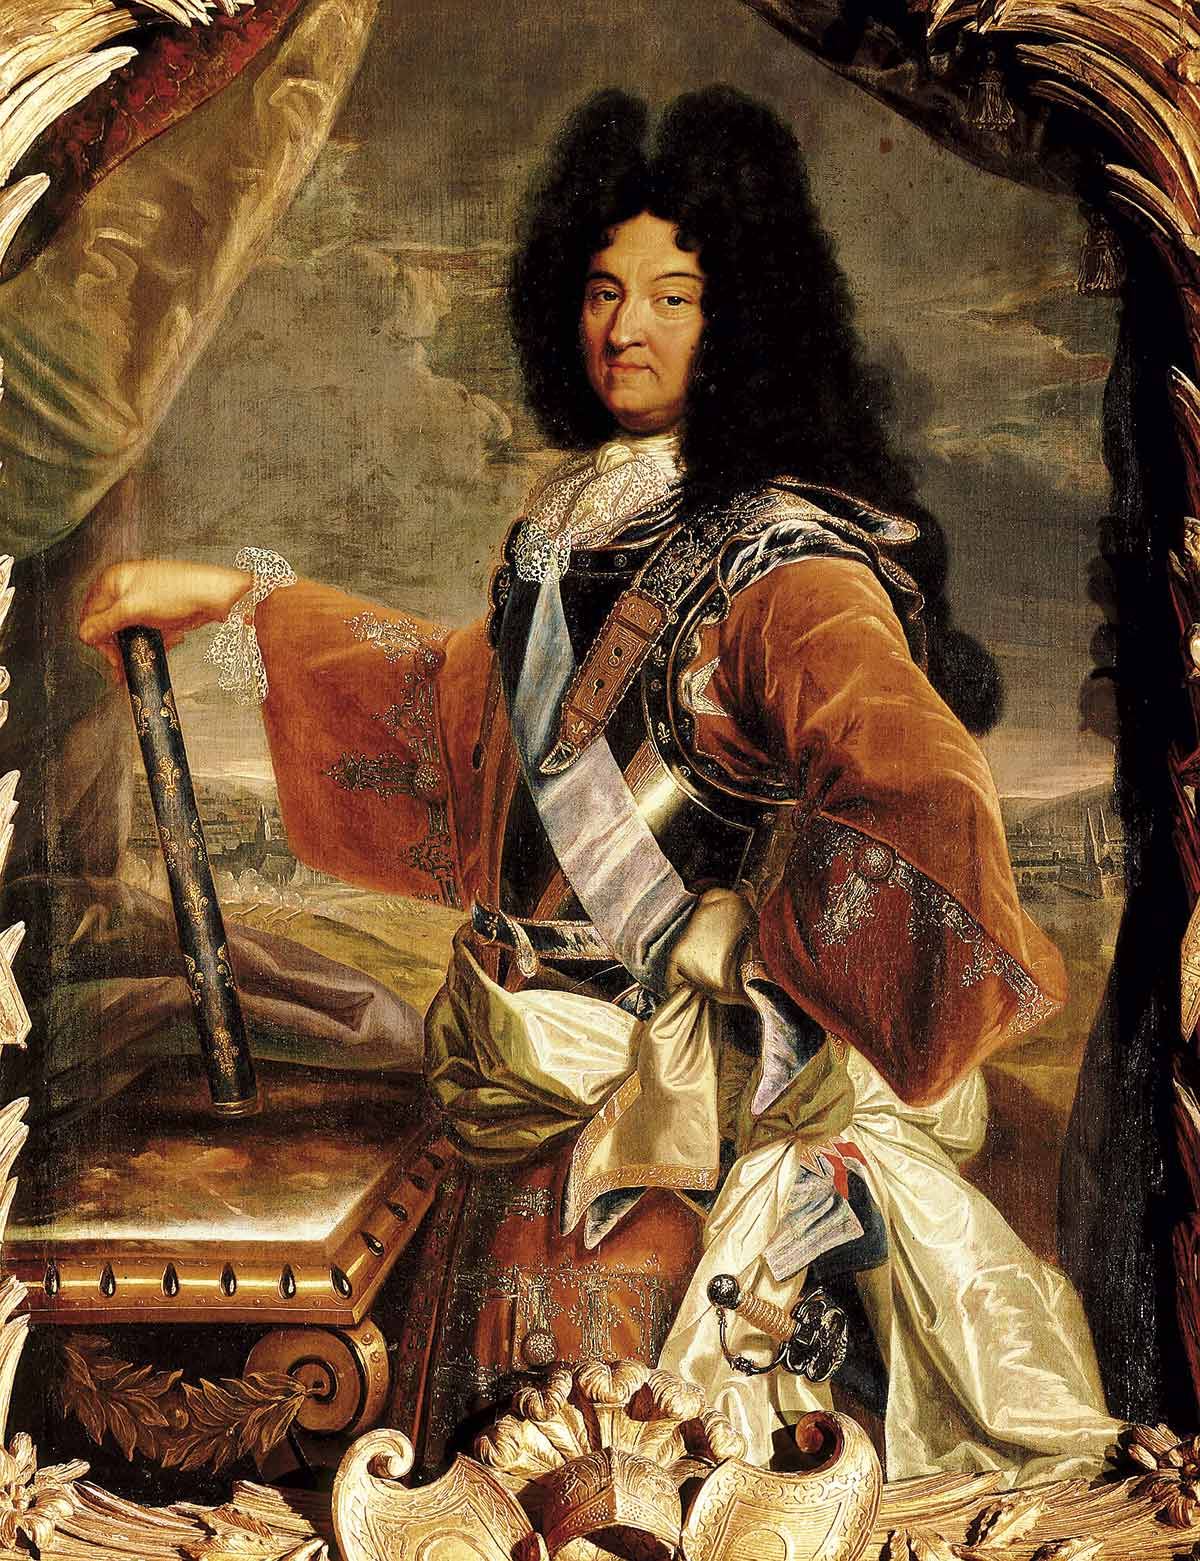 Discursos de Luis XIV